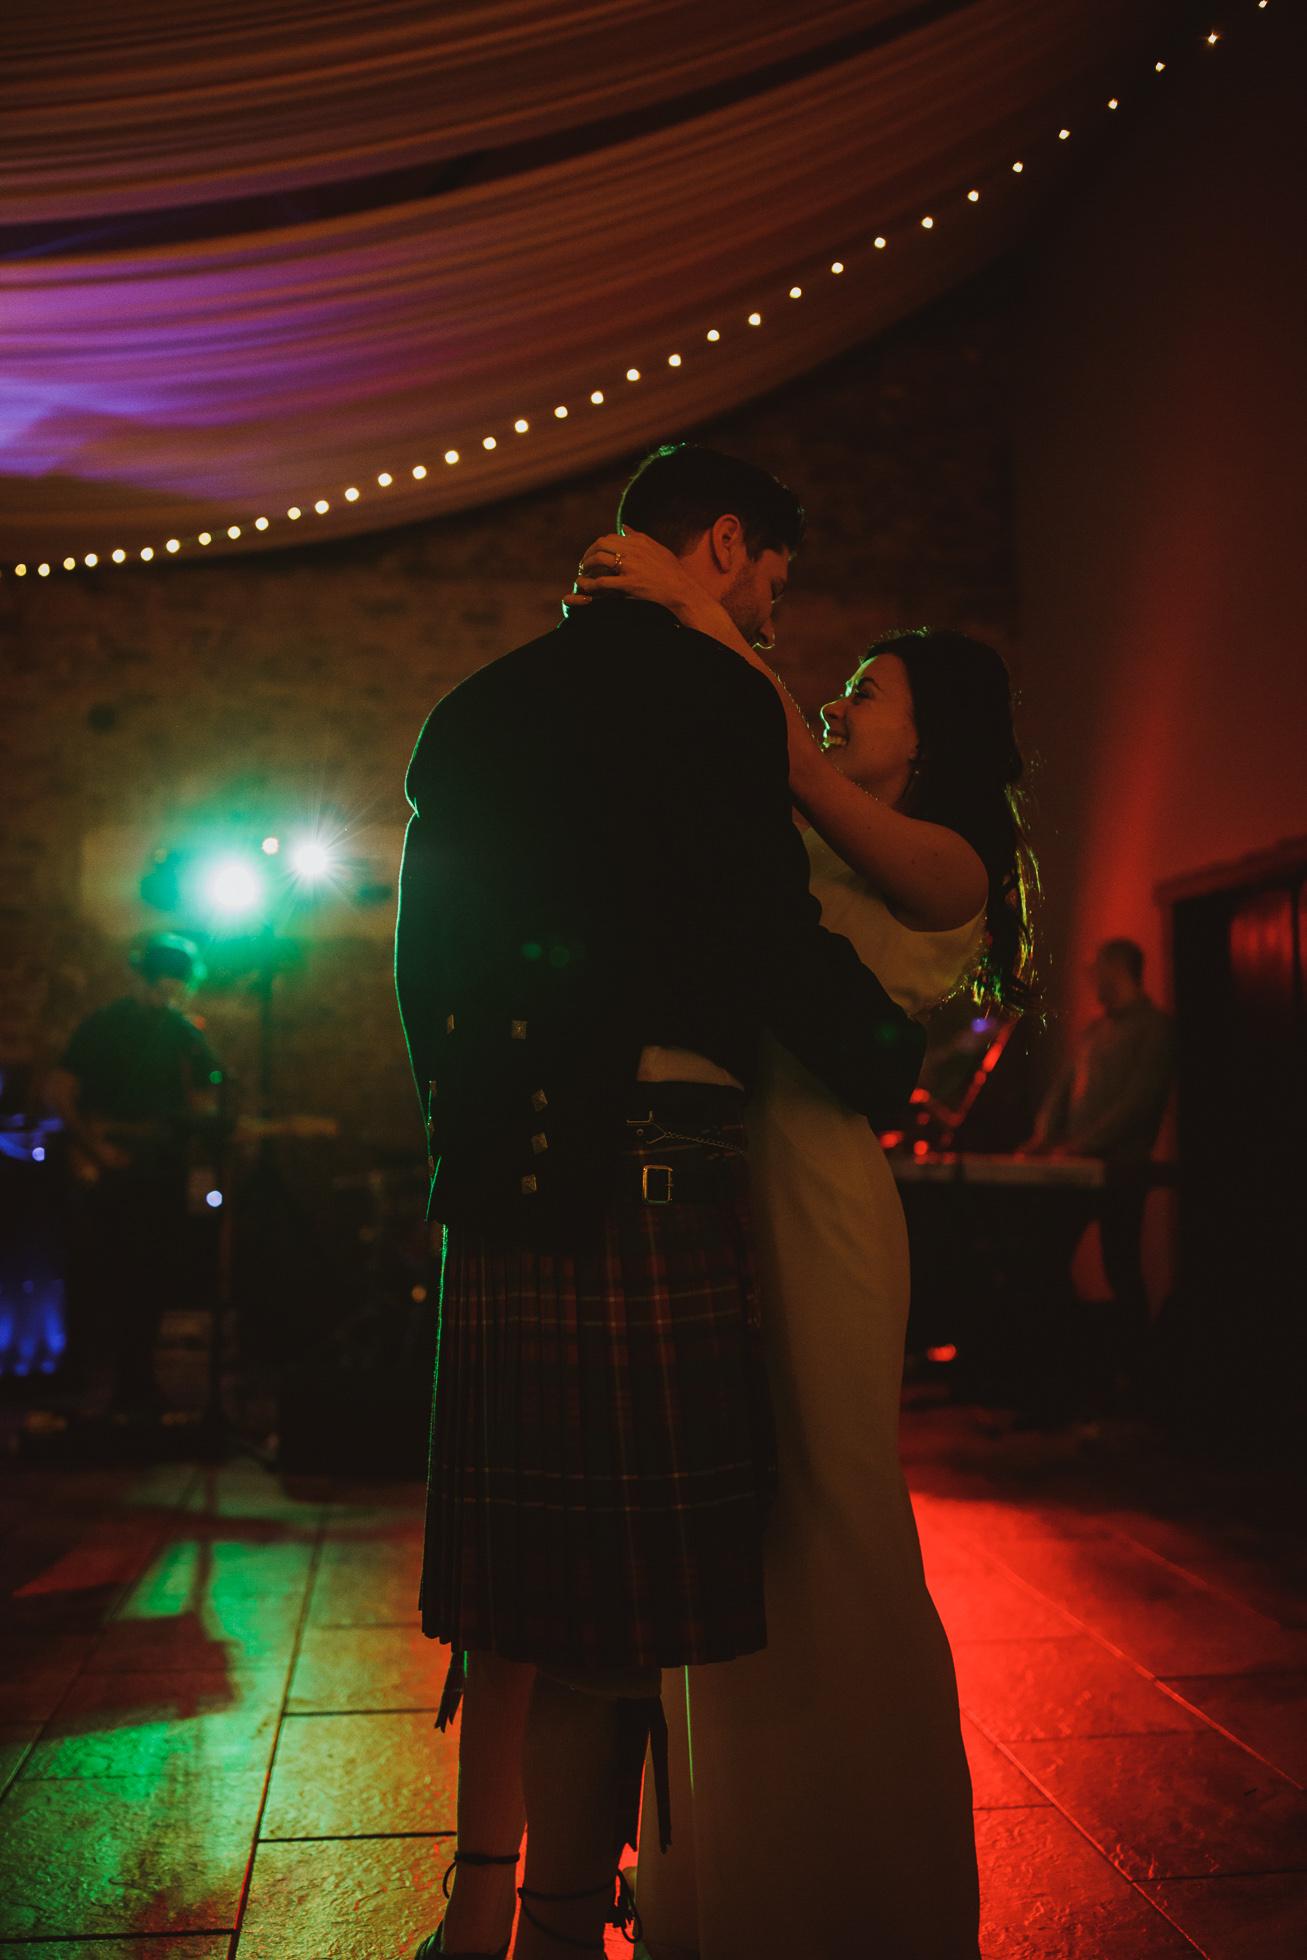 hornington_manor_wedding_photographer-122.jpg